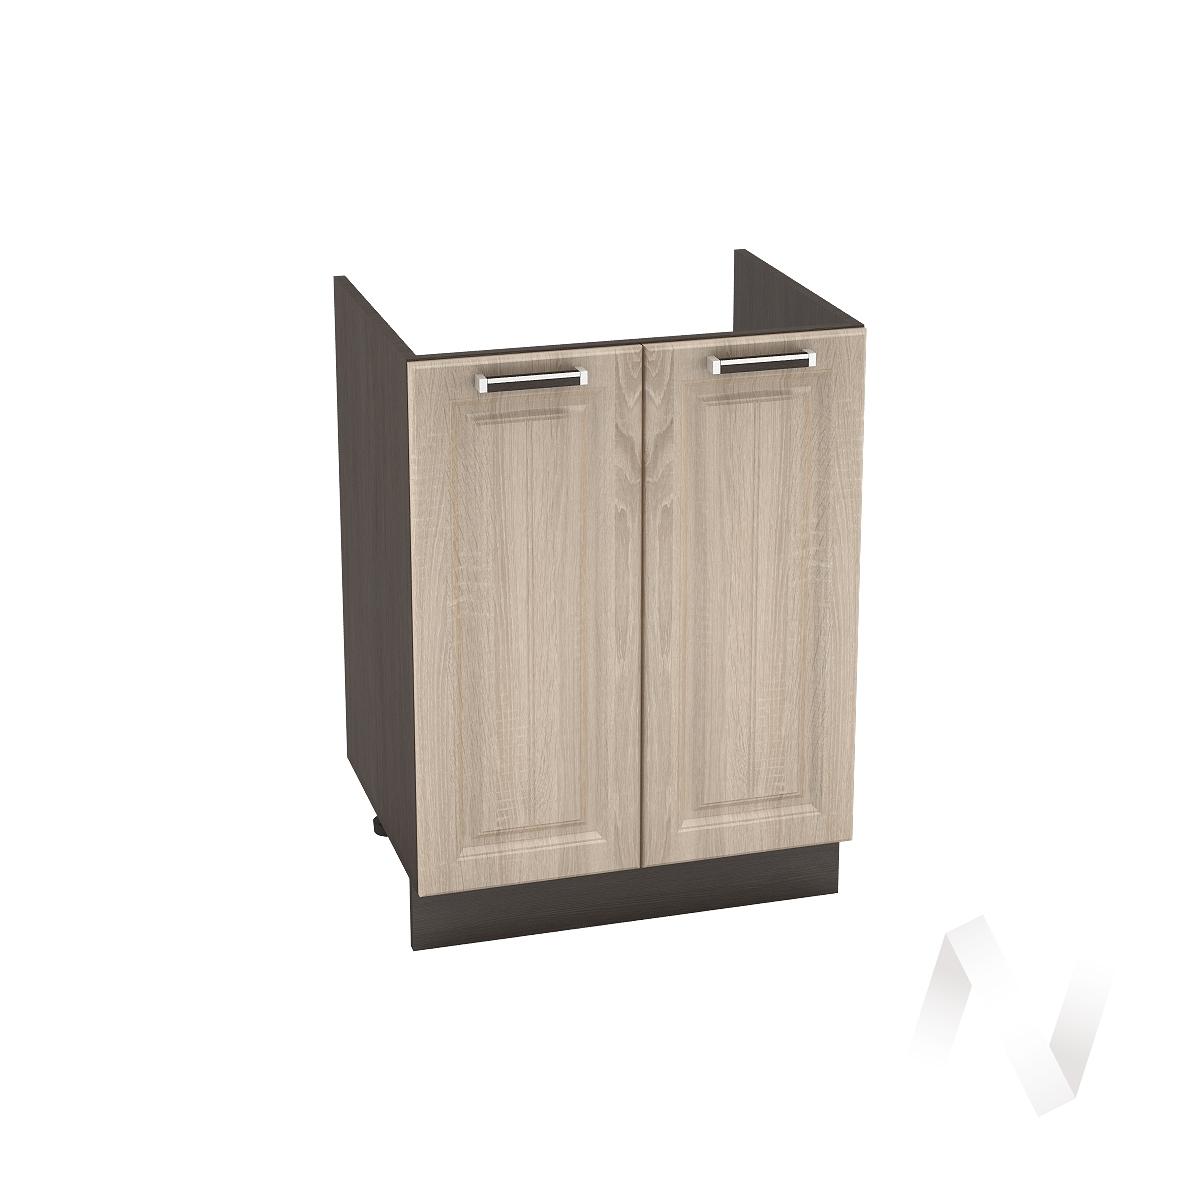 "Кухня ""Прага"": Шкаф нижний под мойку 600, ШНМ 600 (дуб сонома/корпус венге)"